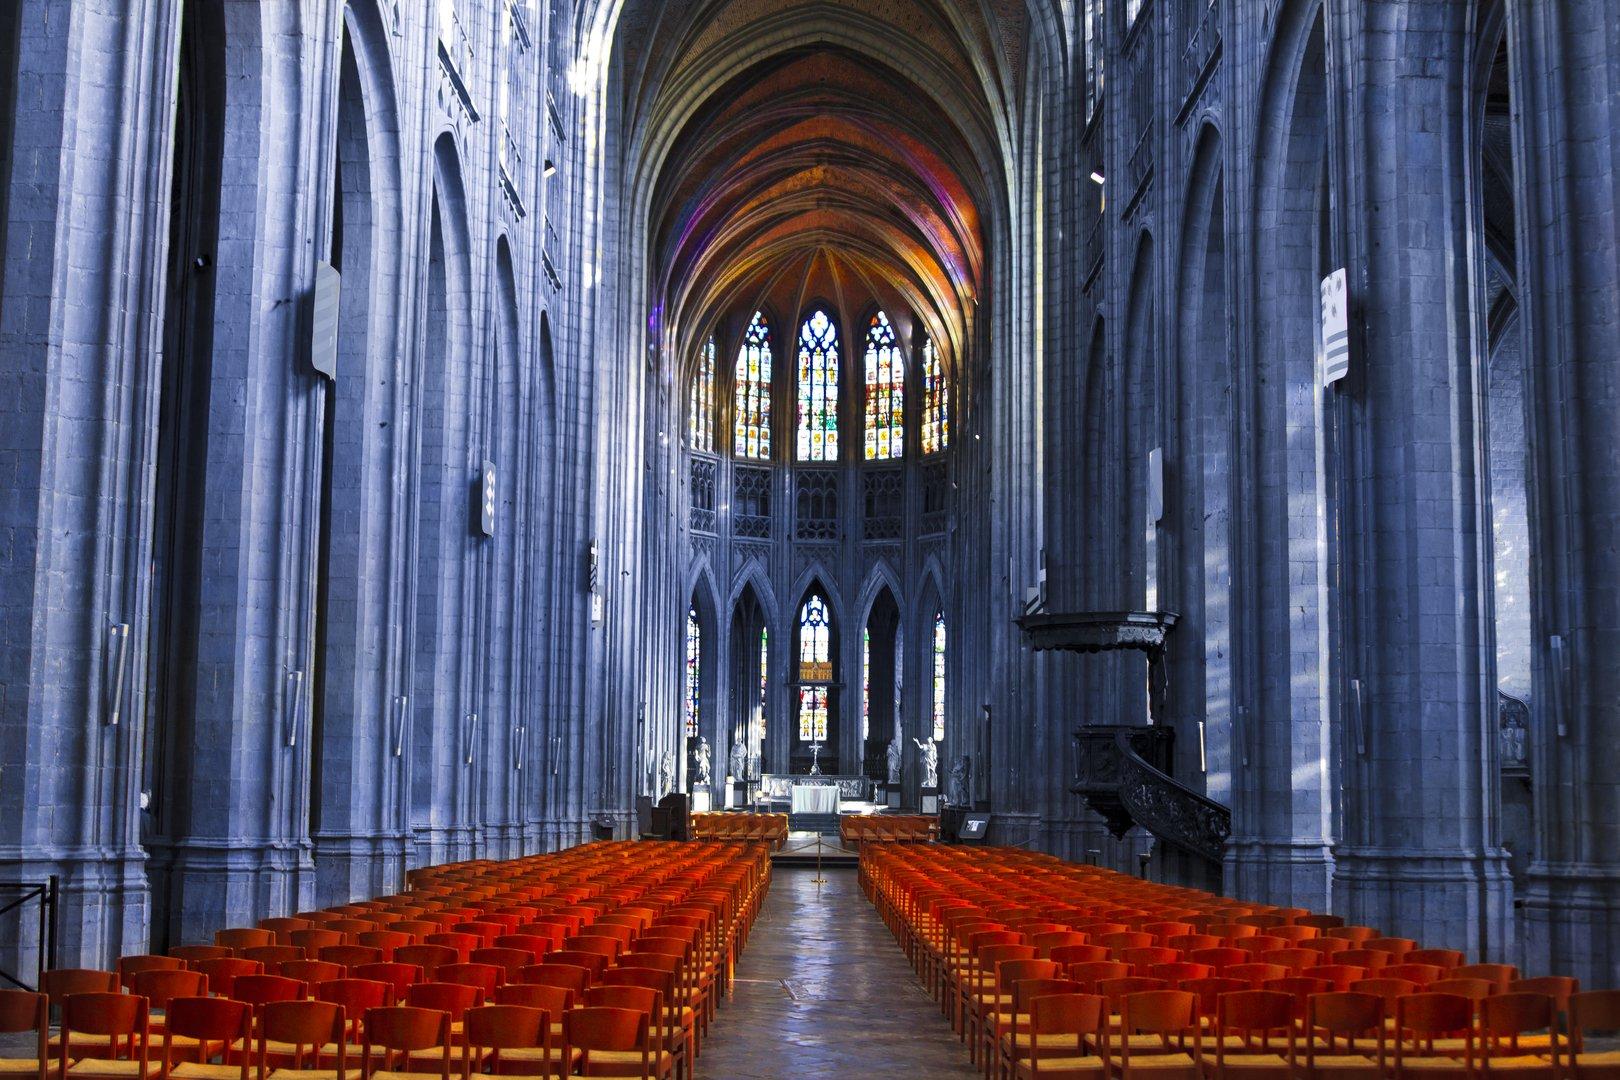 Waltrudiskirche